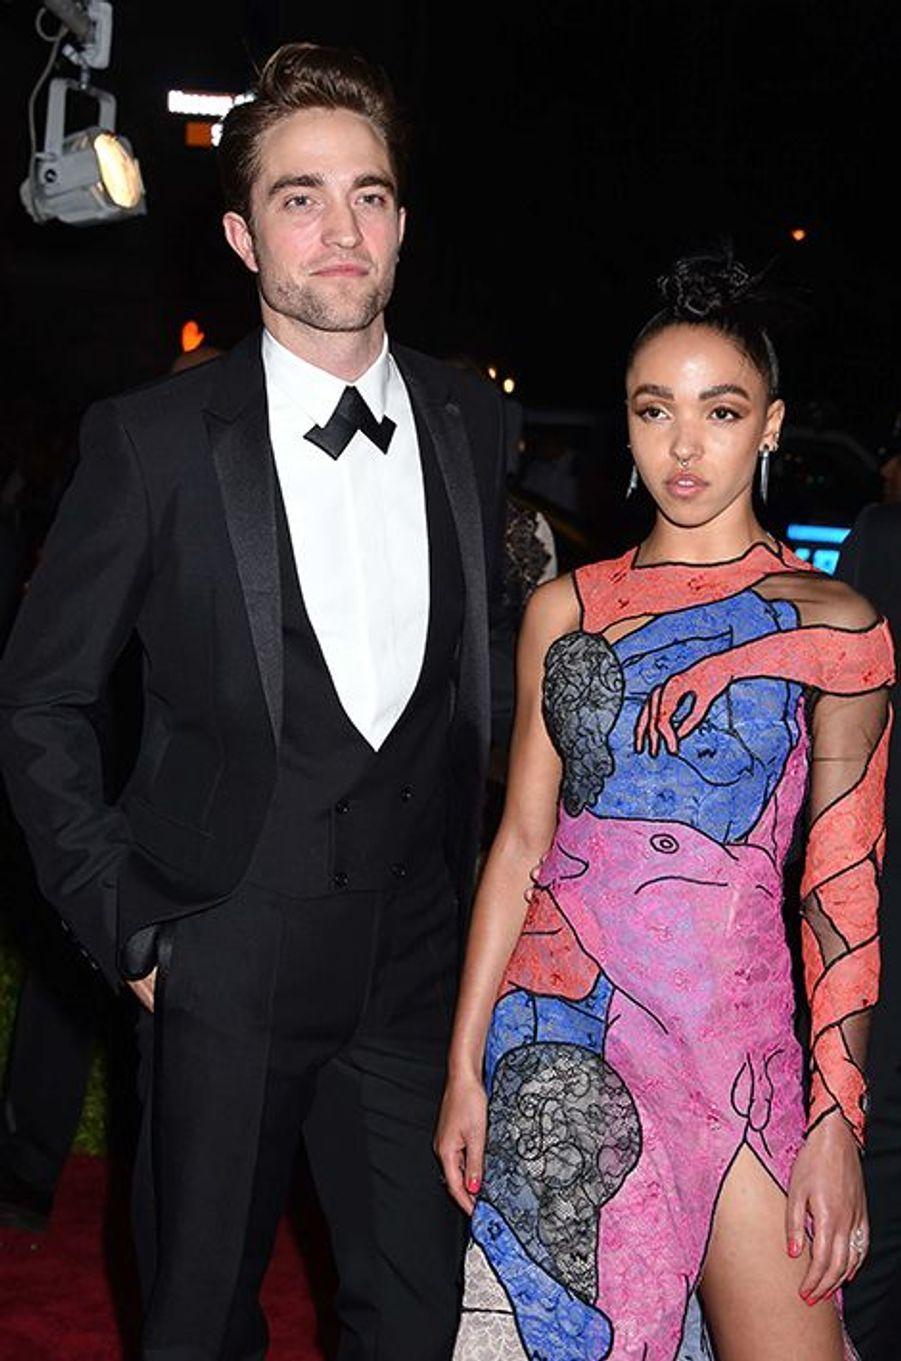 Robert Pattinson en Dior et sa fiancée, FKA Twigs. La chanteuse portait du Christopher Kane